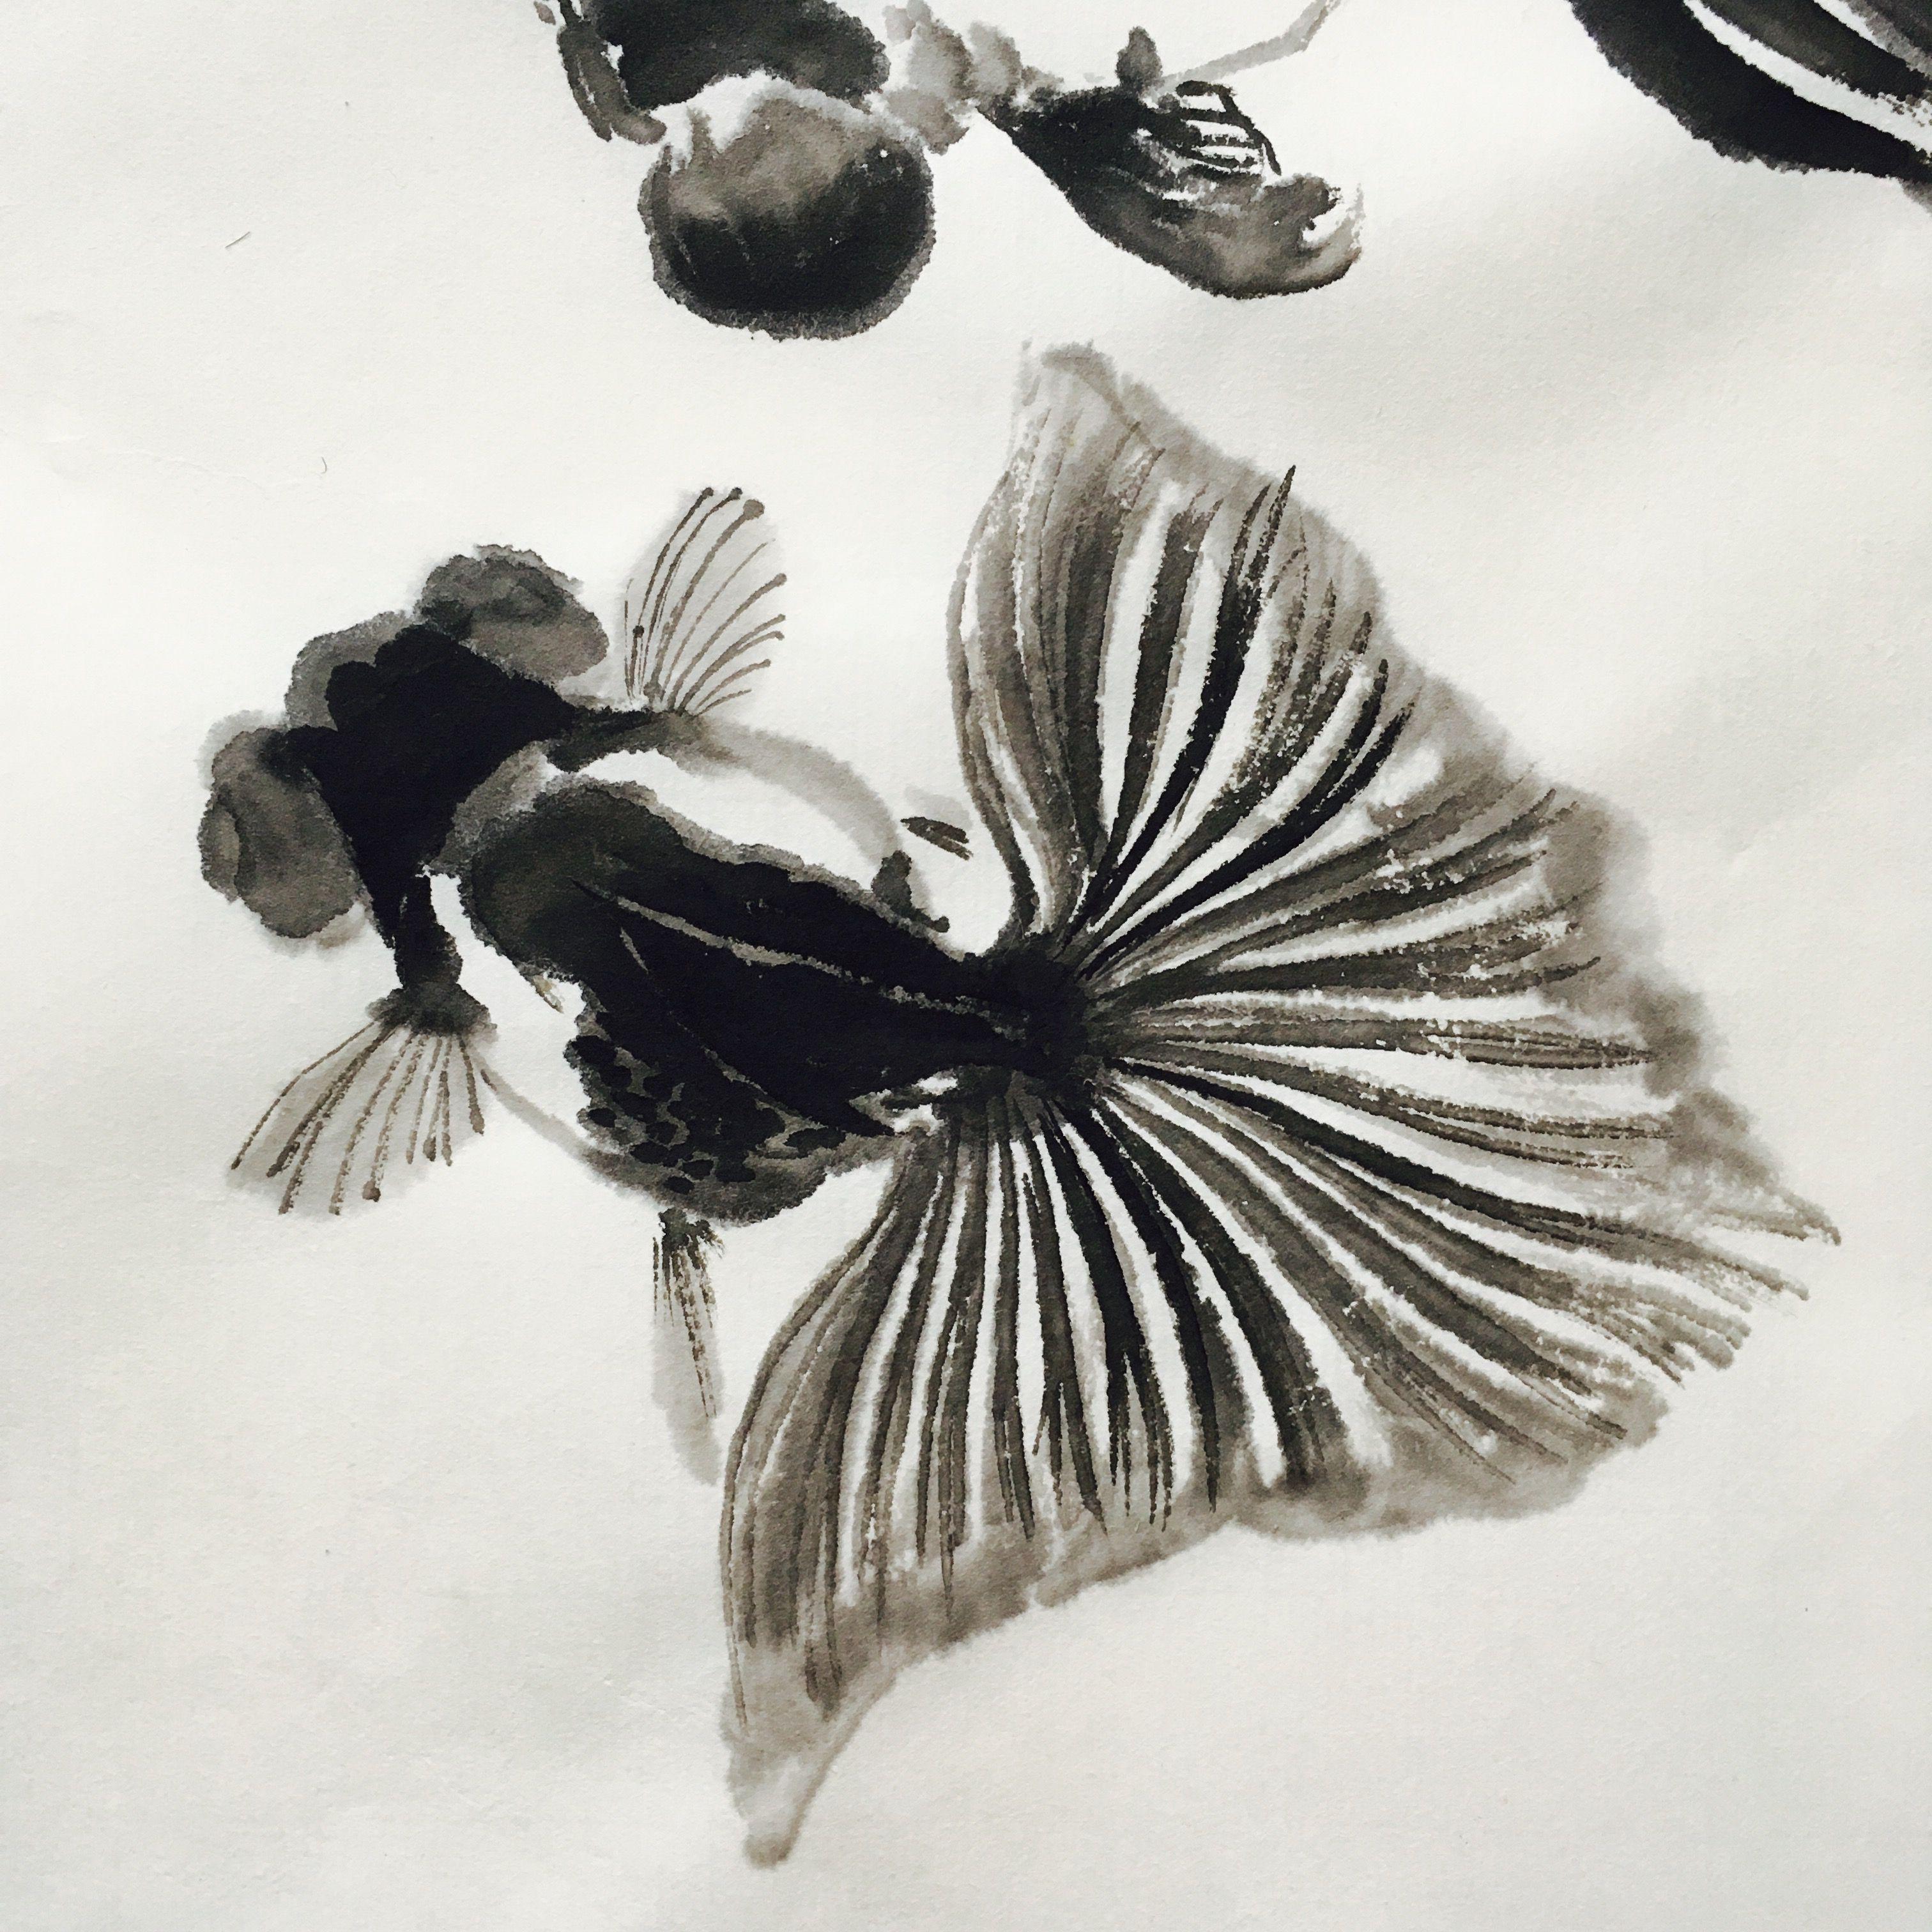 Pin de 森 en 金魚 | Pinterest